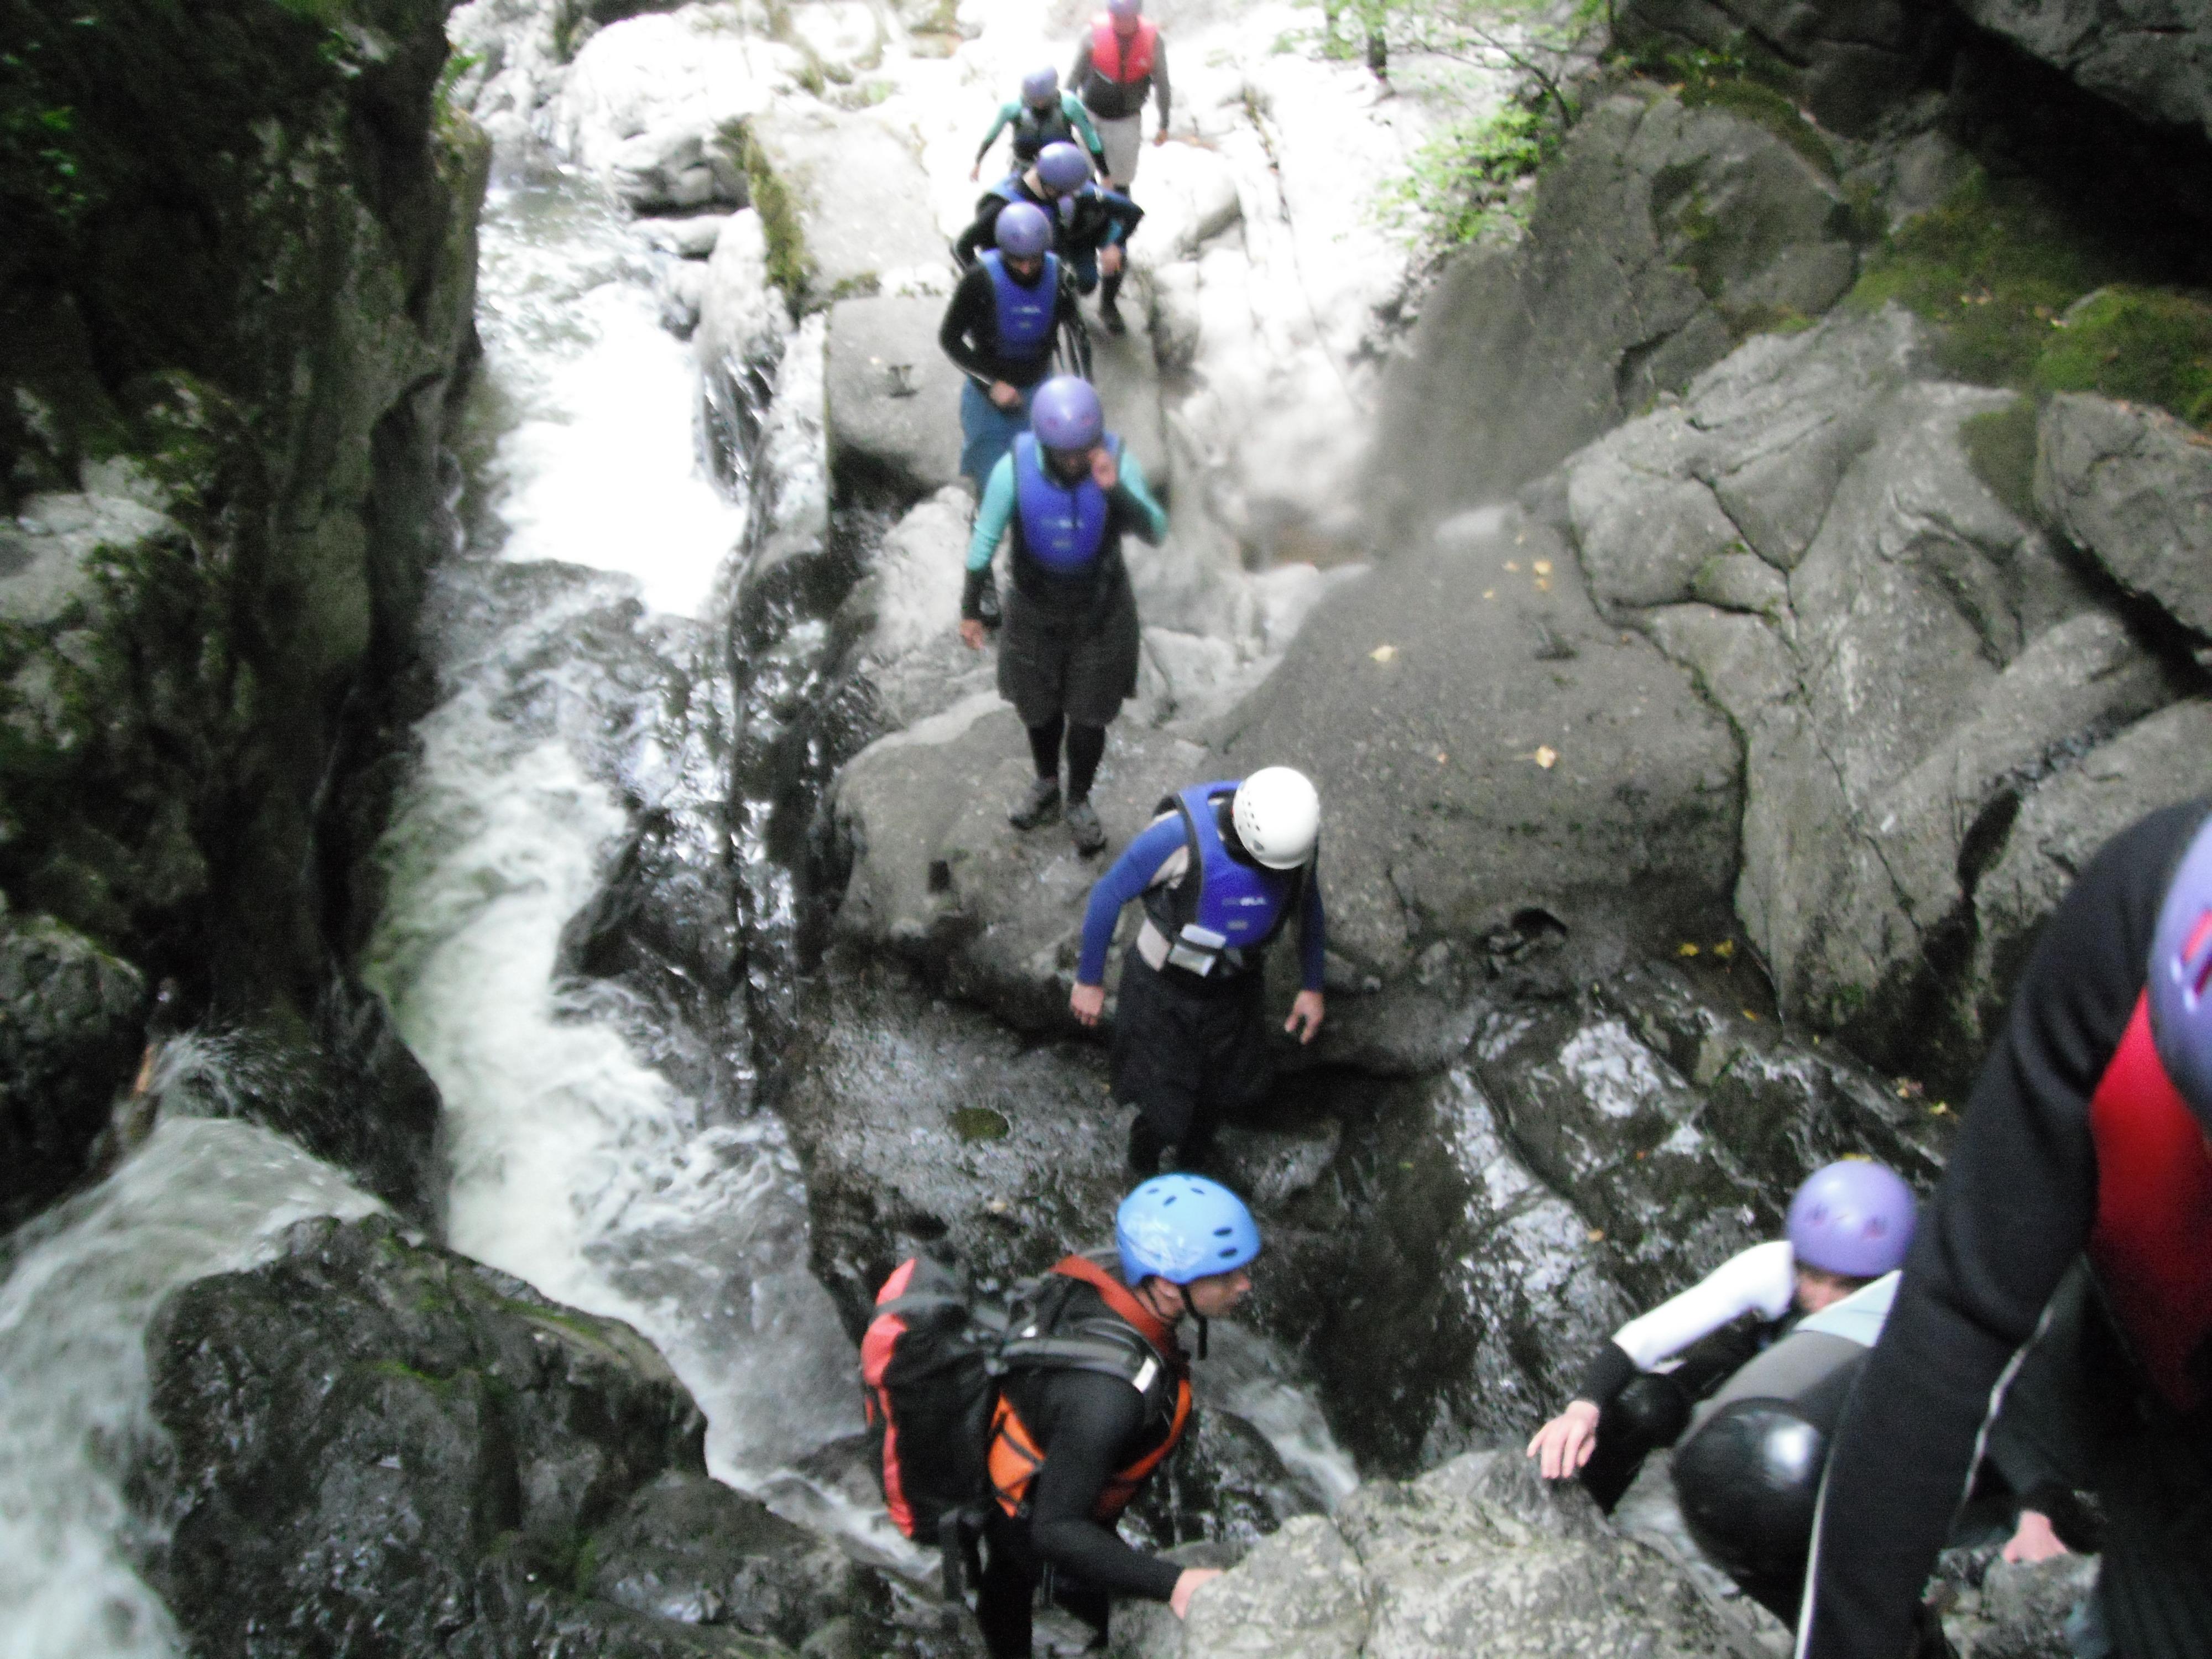 Gorge Walking Canyoning Wales